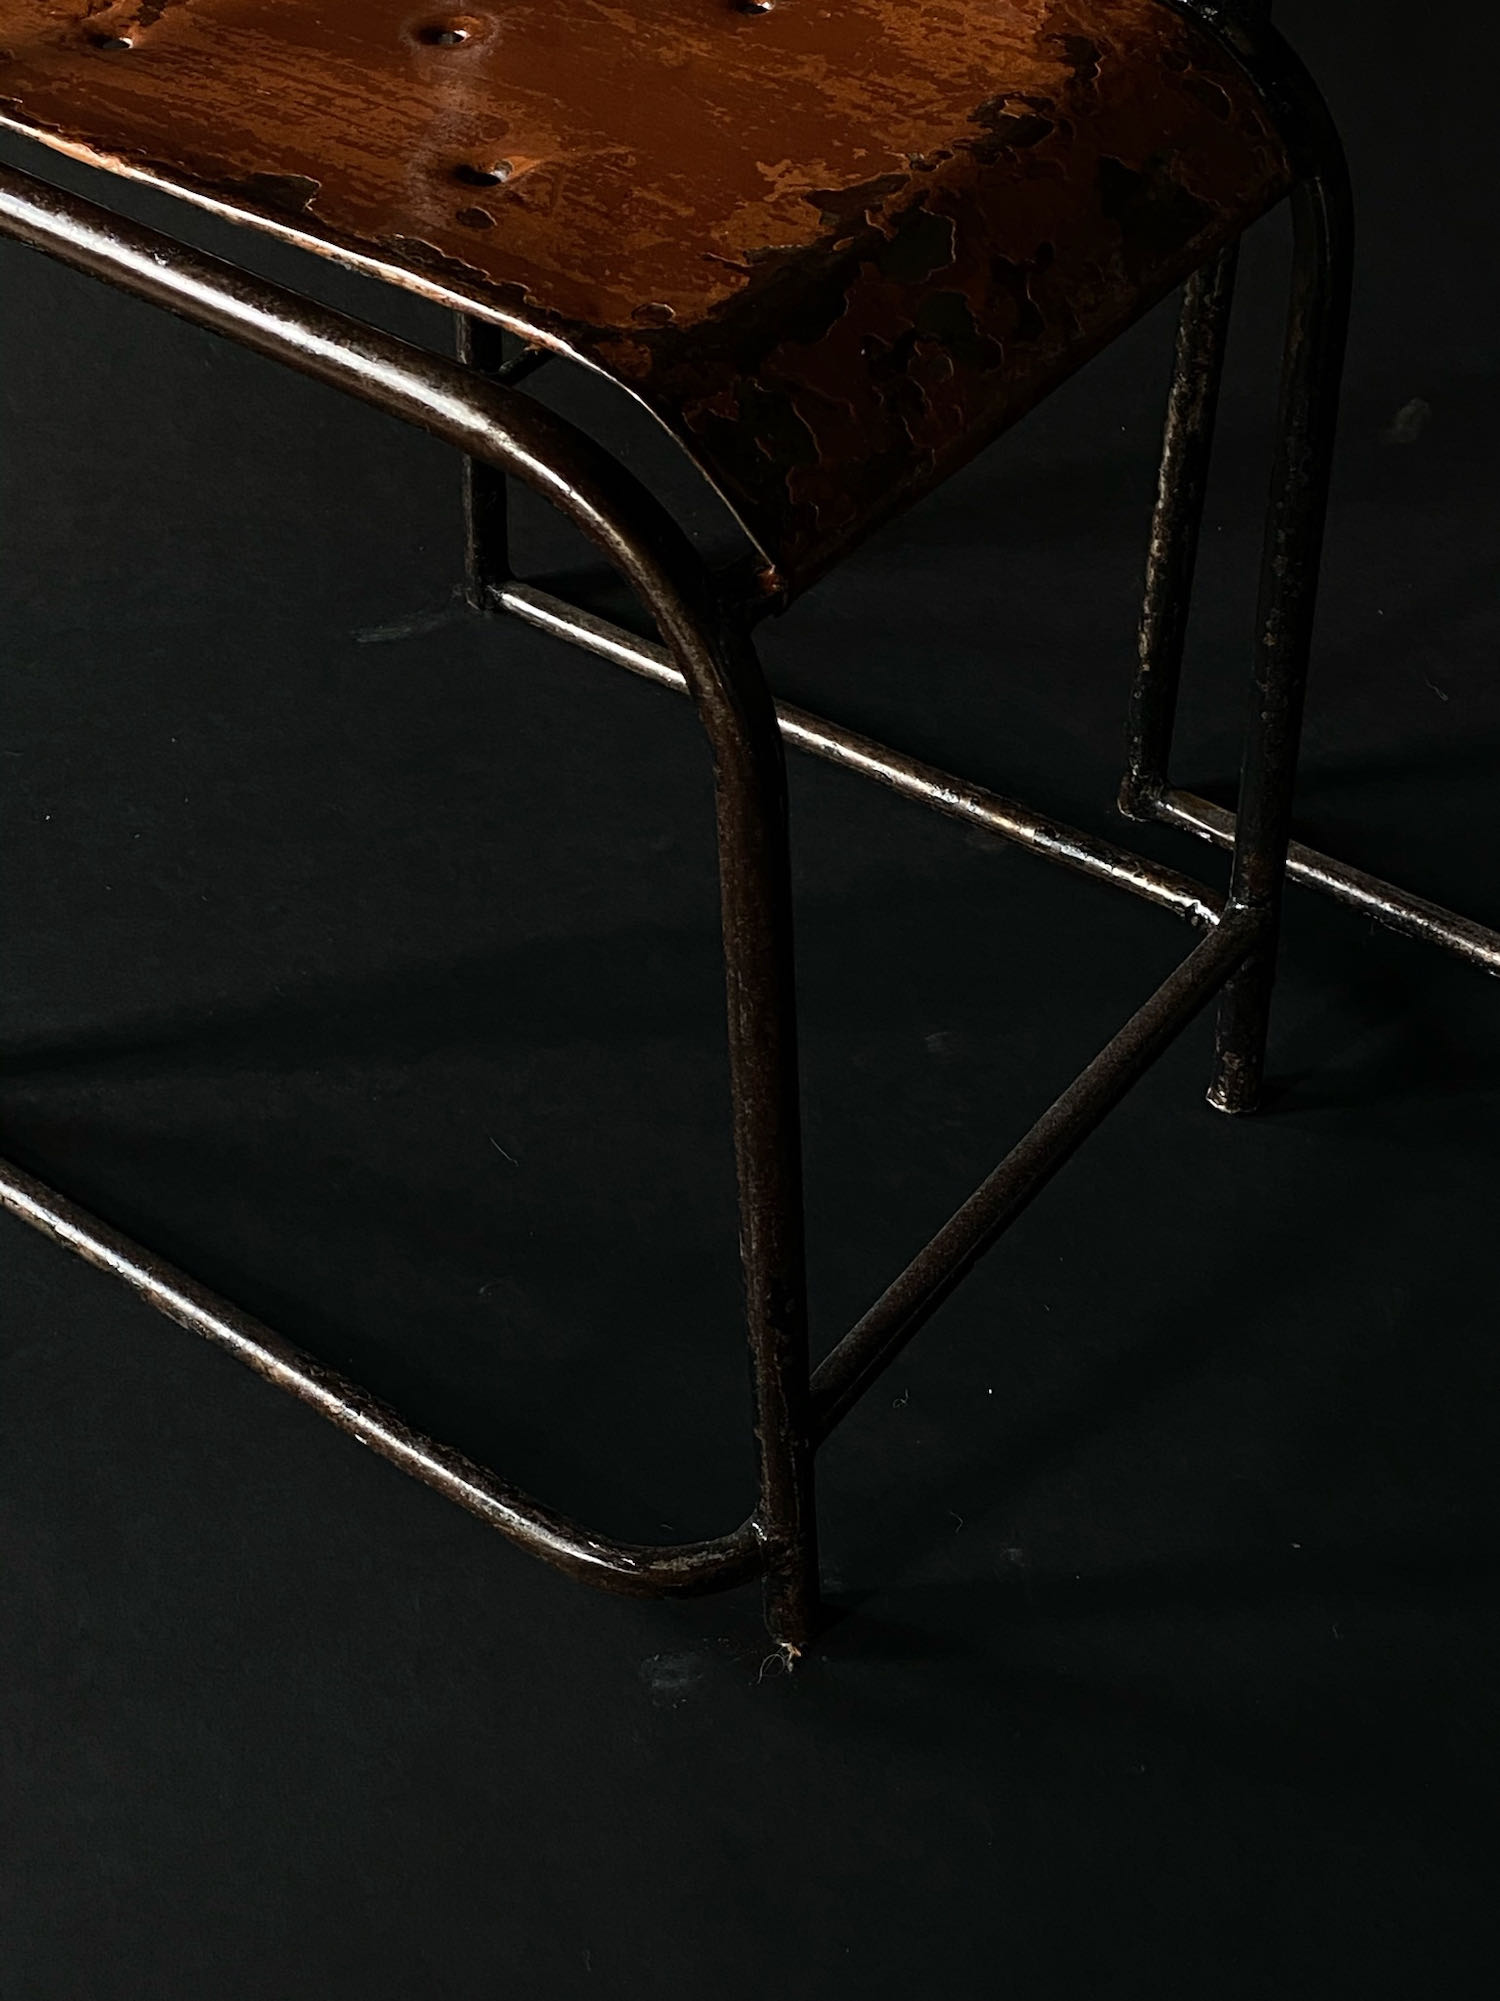 20091105a – 5